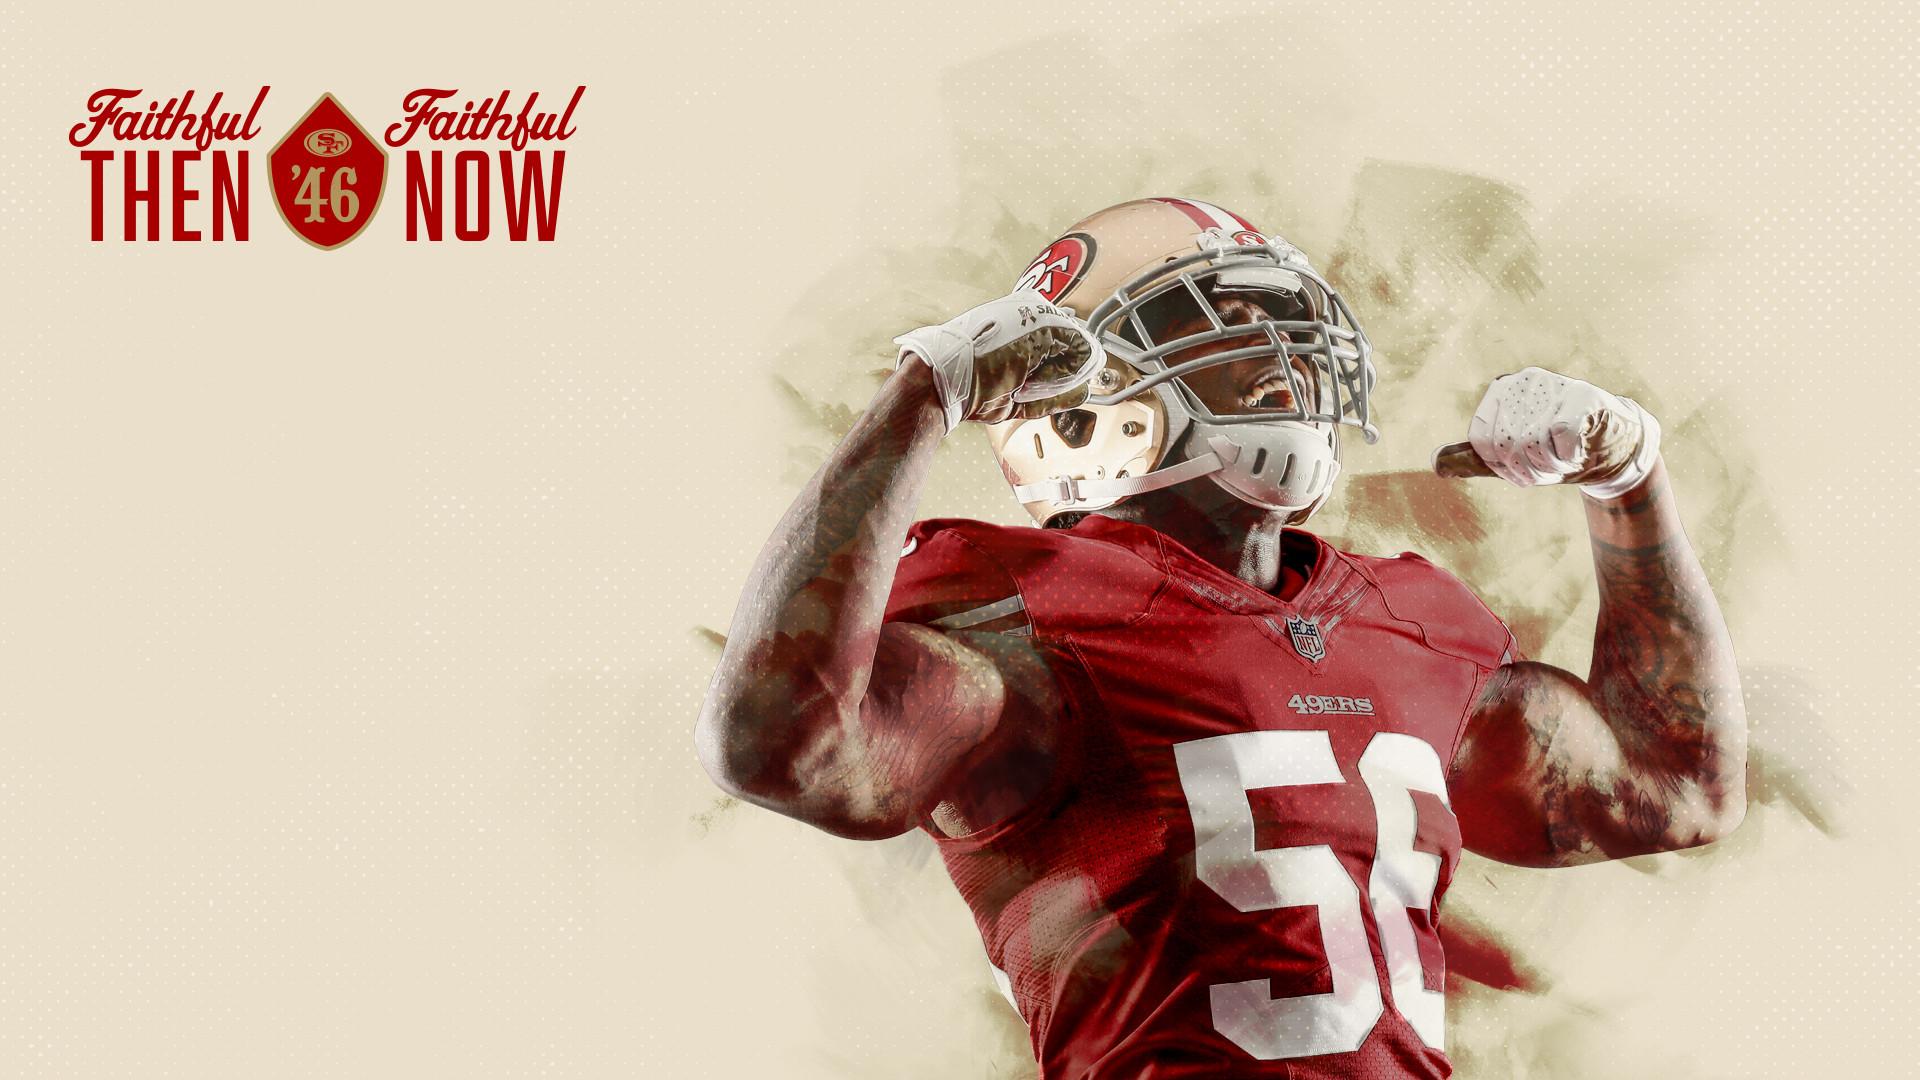 49ers.com | Wallpapers .